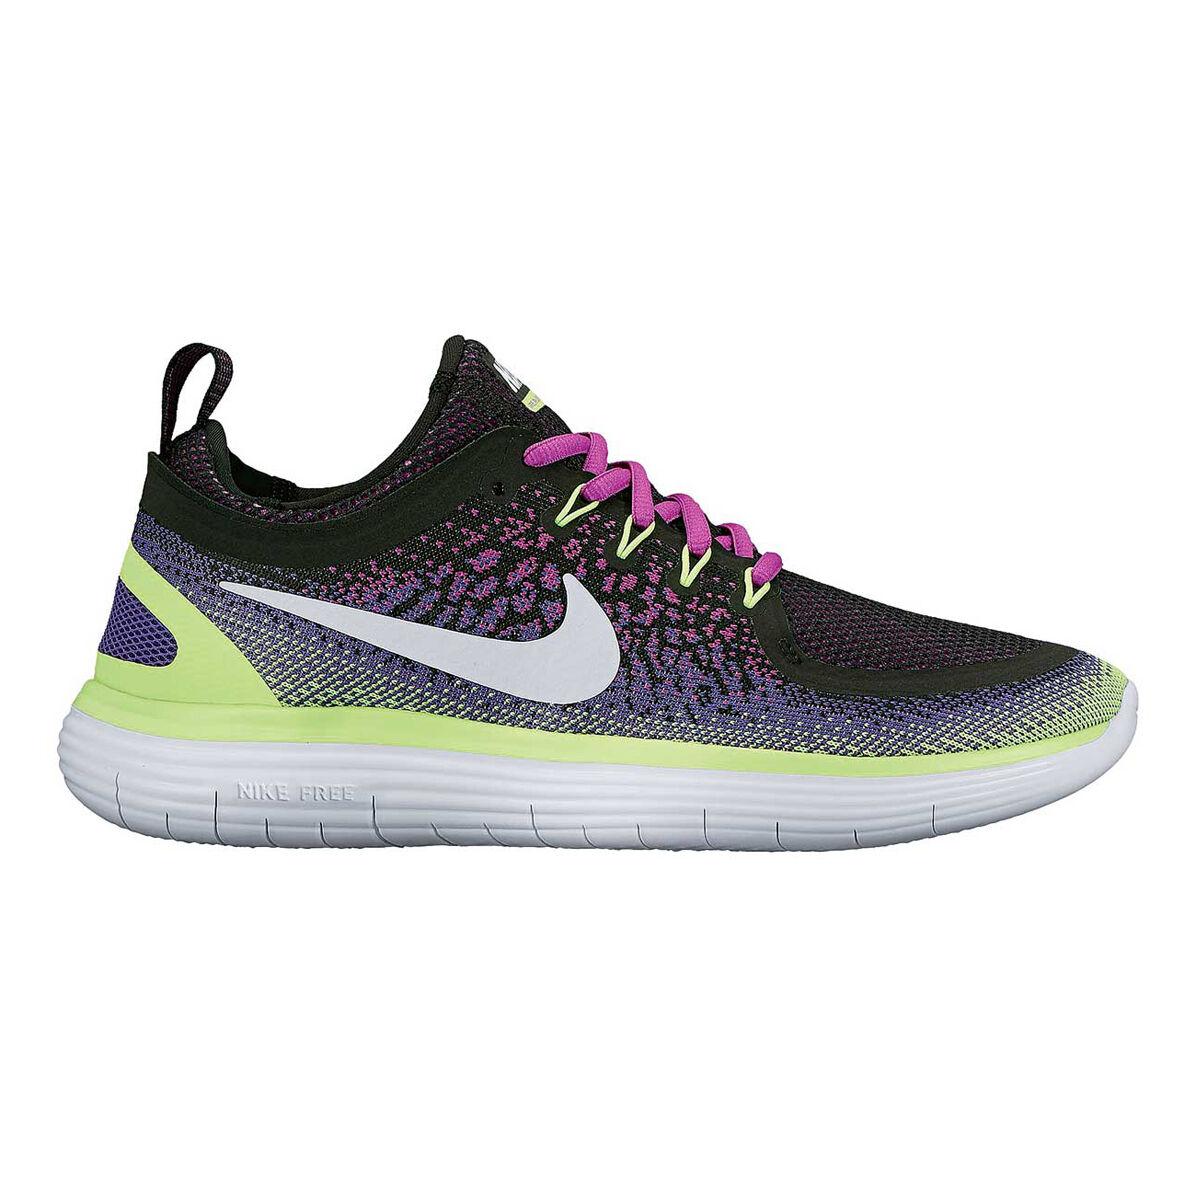 14a62440552e ... low price nike free run distance 2 womens running shoes black purple us  7 black 6a97e